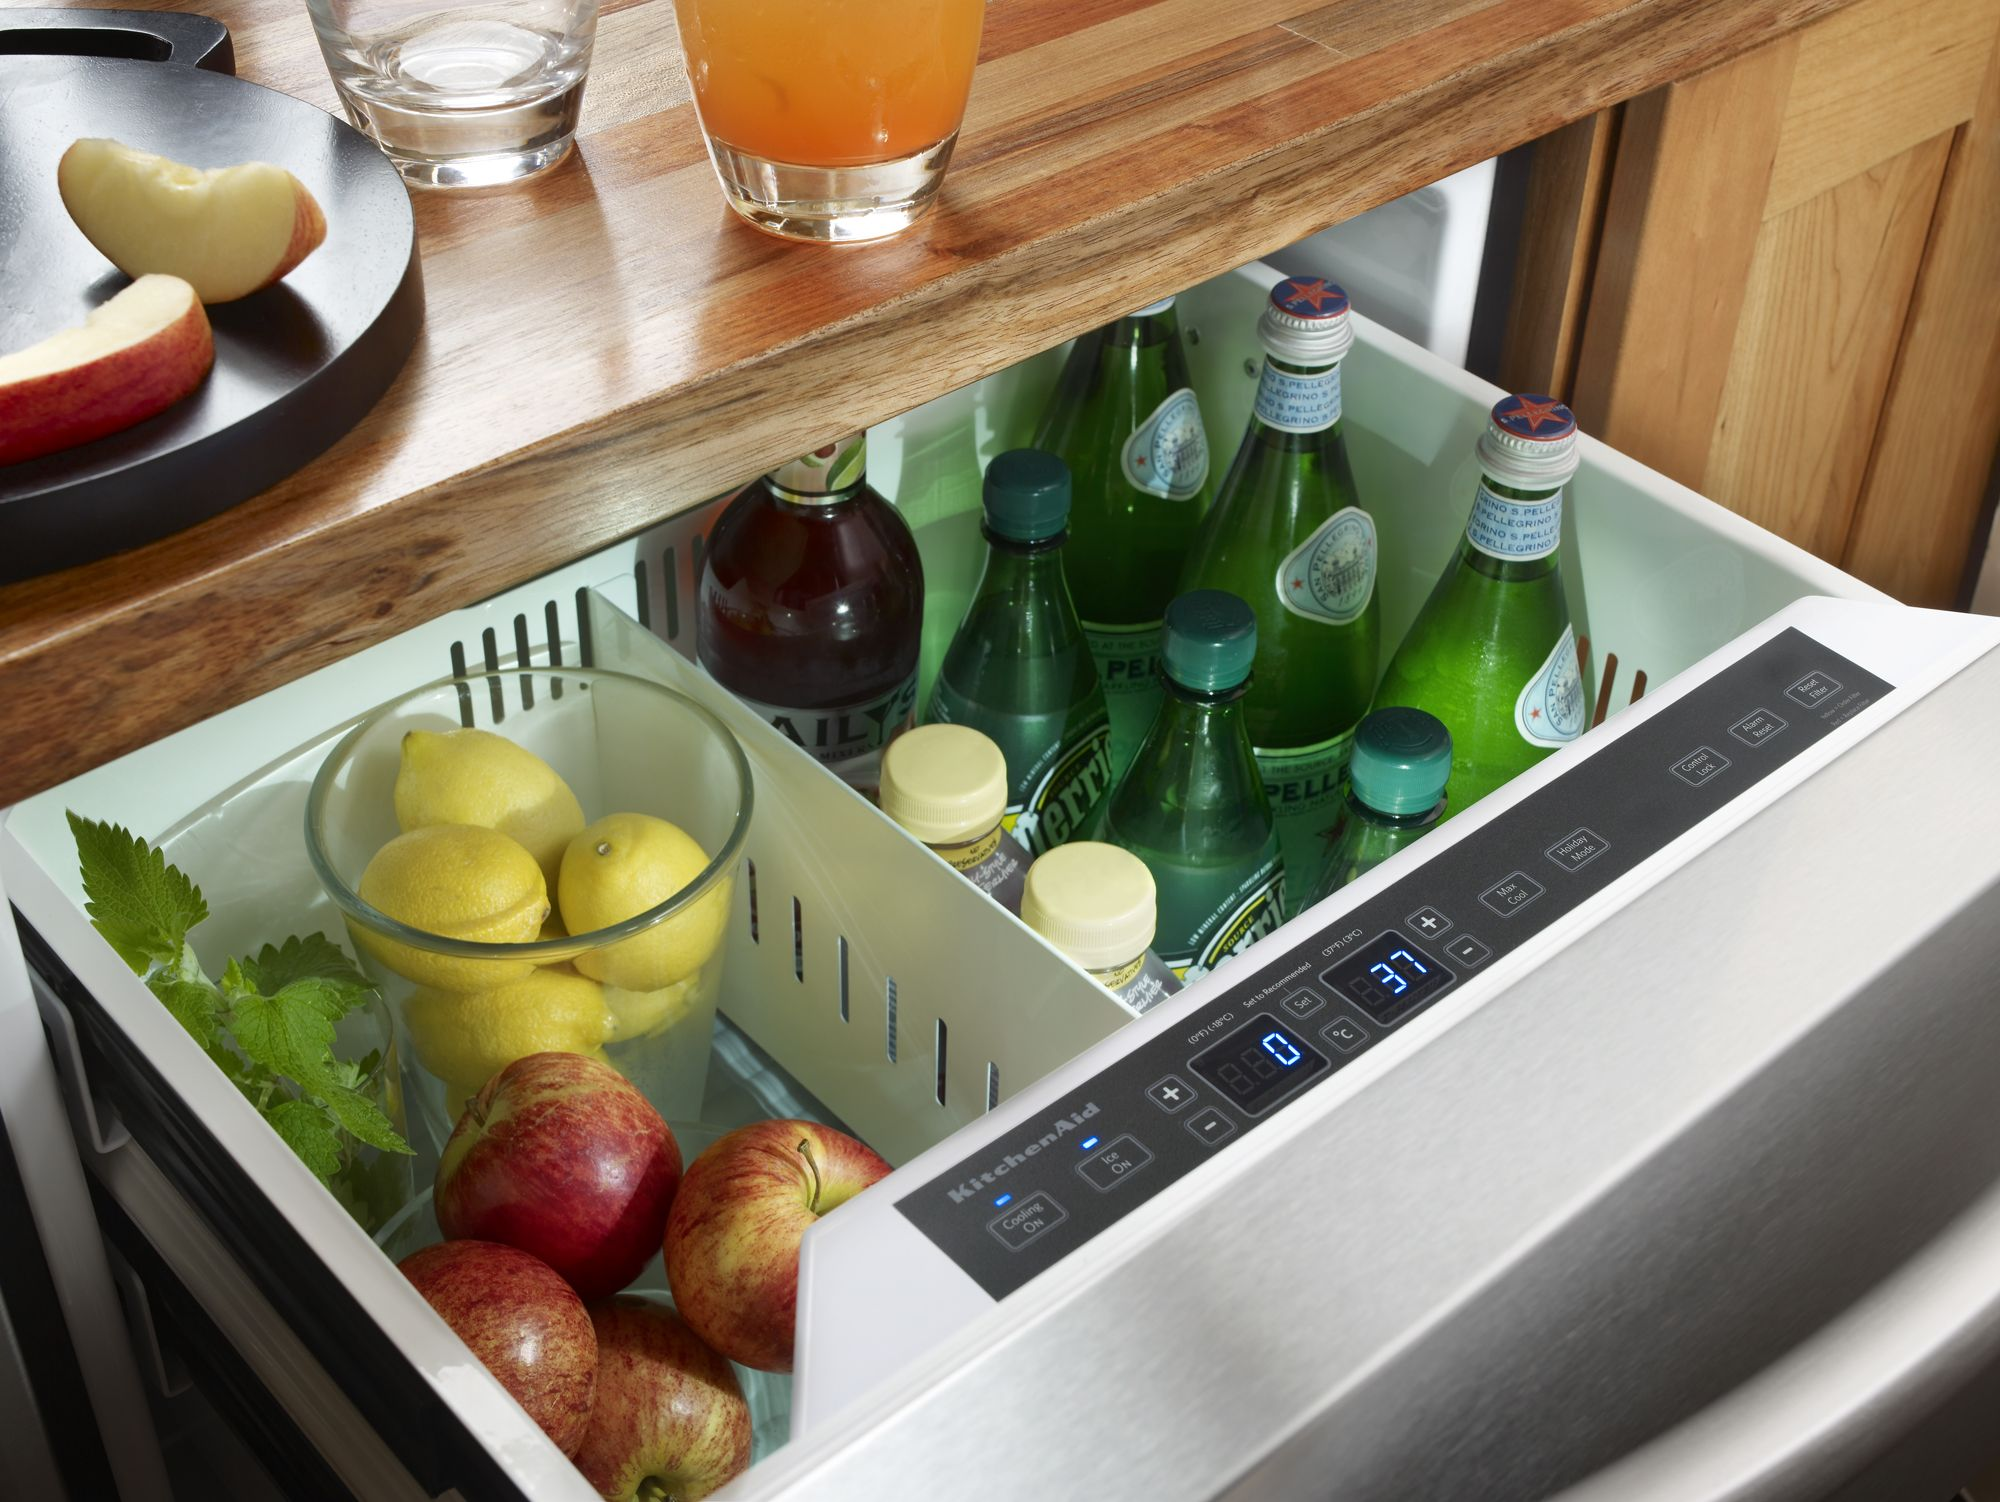 KitchenAid 4.8 cu. ft. Refrigerator/Freezer Drawer w/ Ice Maker